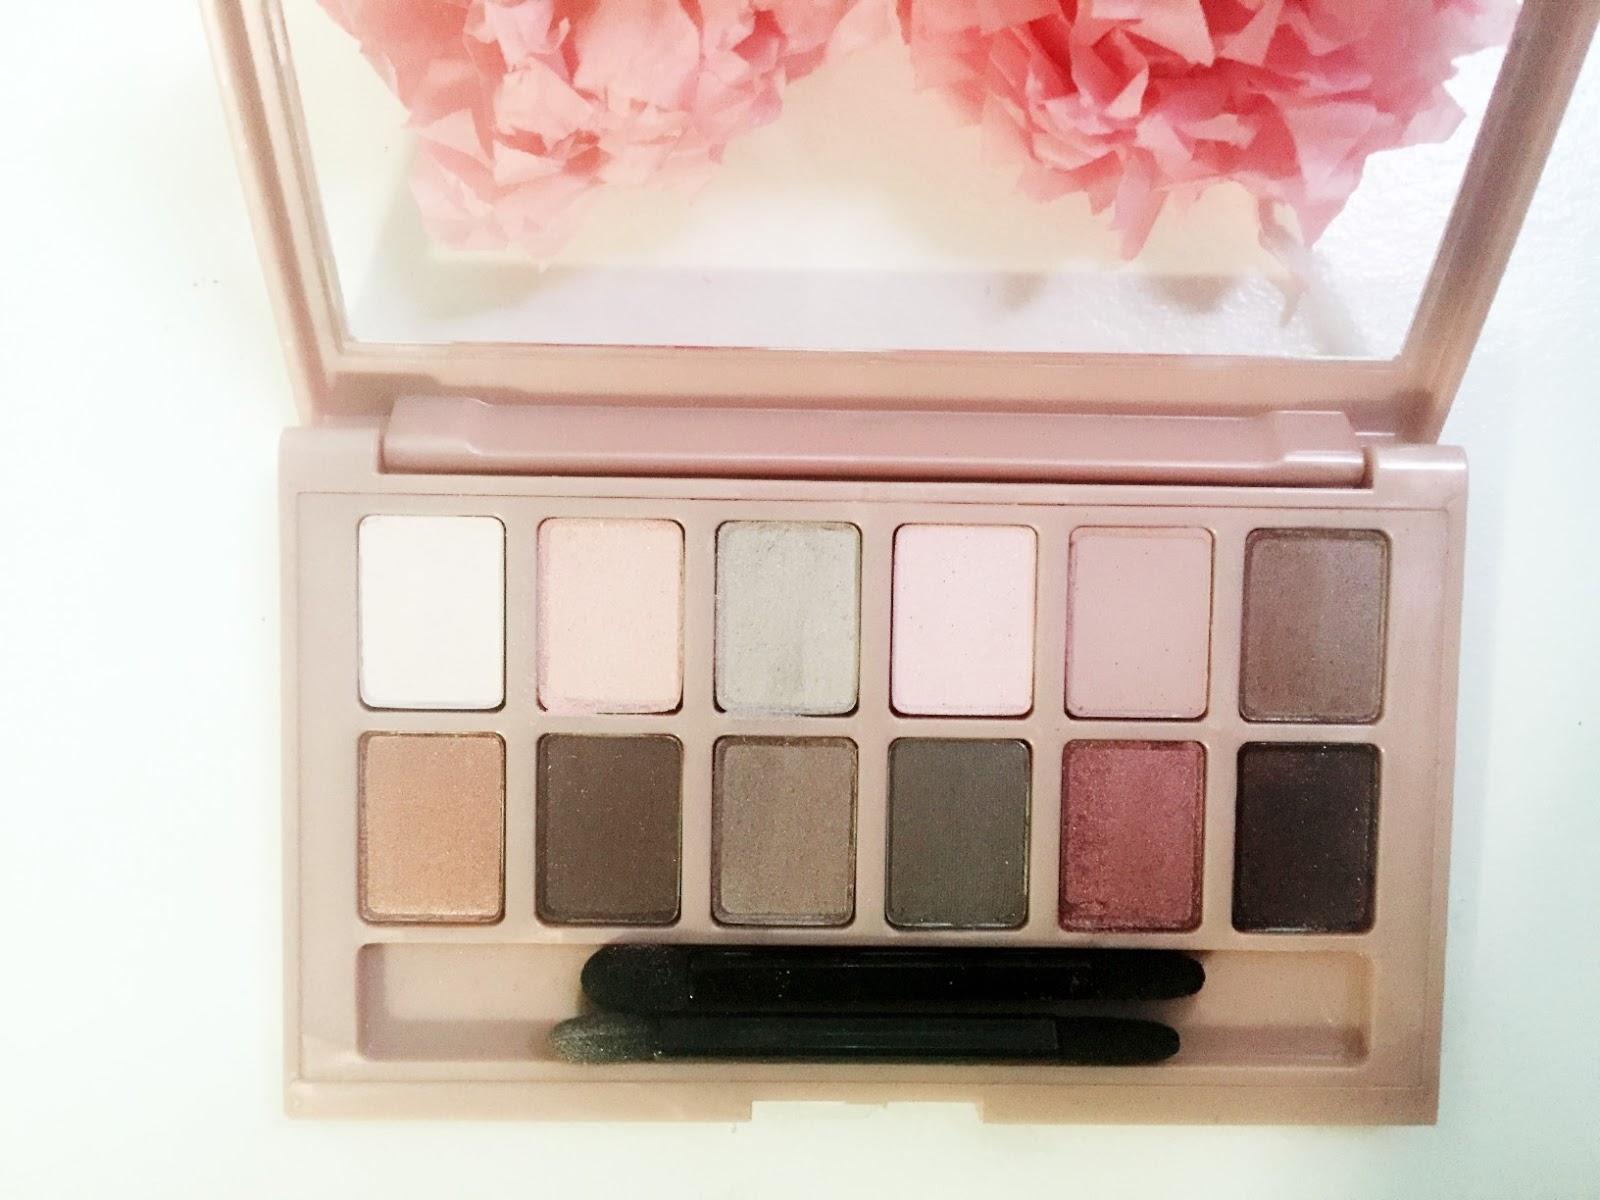 Maybelline nude blush — photo 8